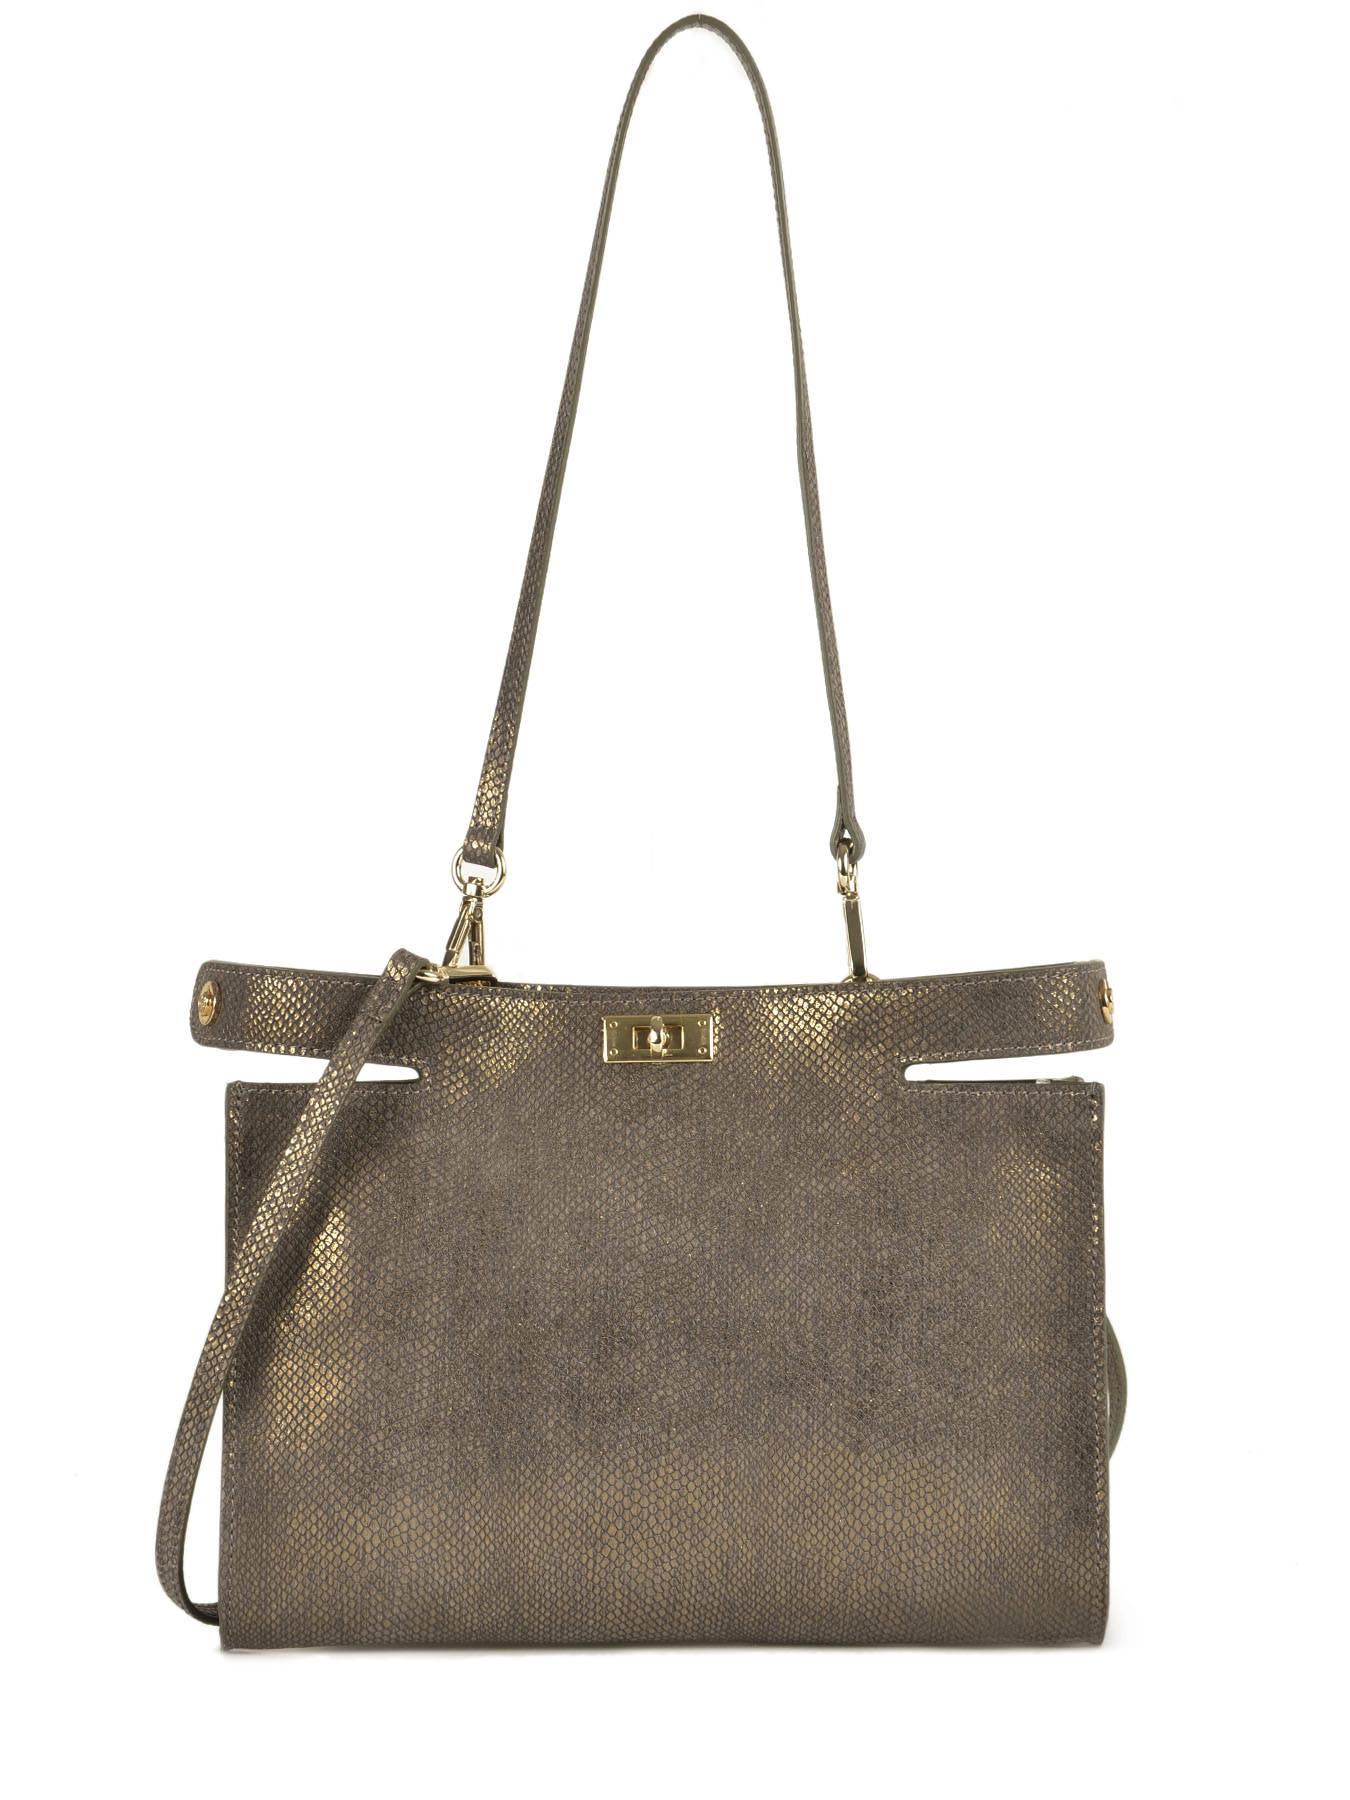 Sac Bandoulière Fashion La pomme de loveley Vert fashion LPF16-57